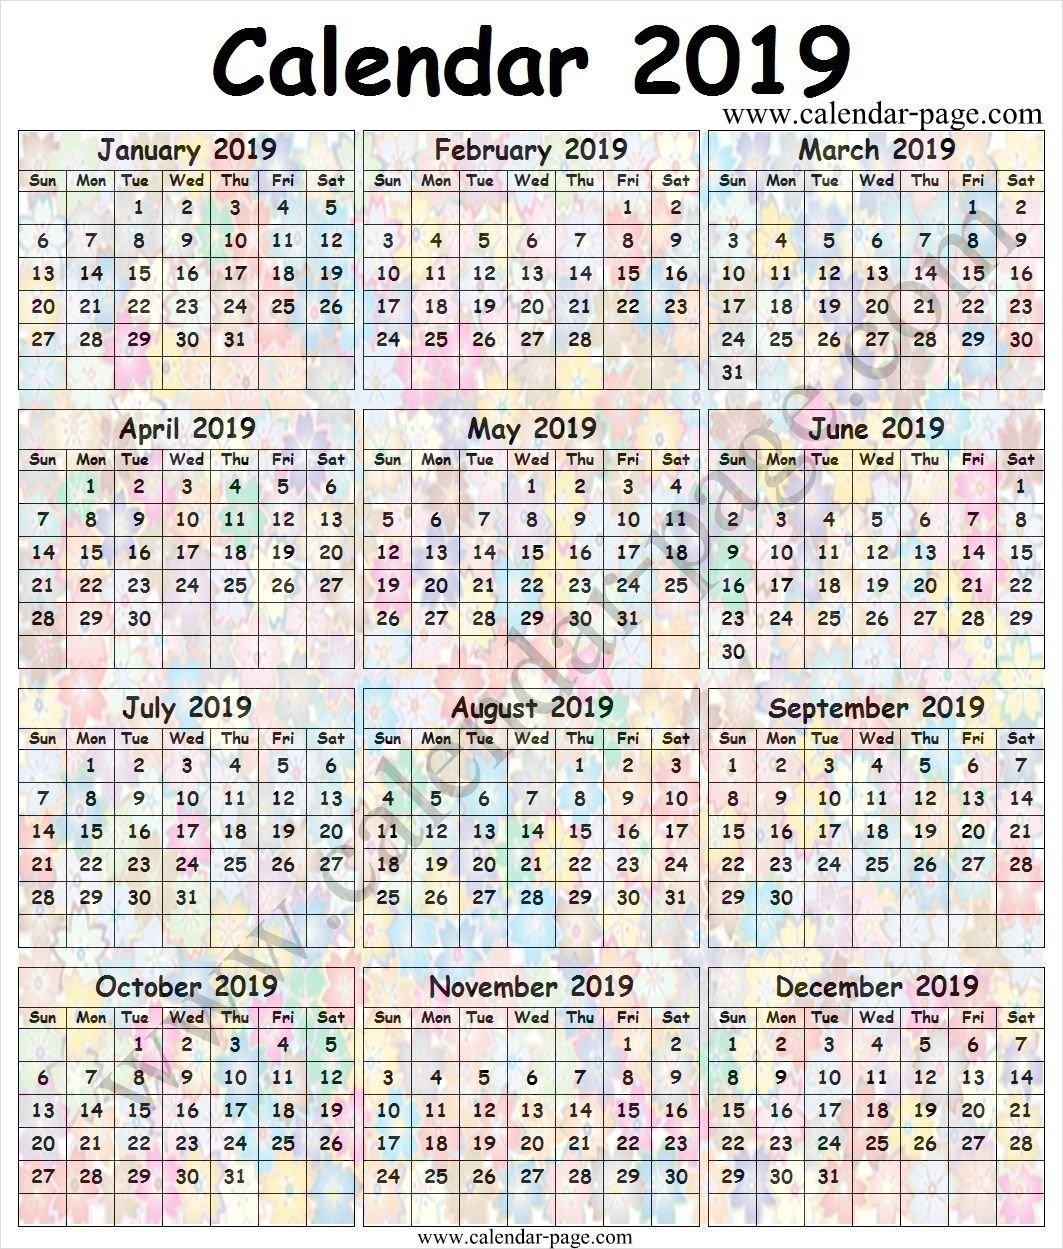 Tamil Monthly Calendar 2019 | Calendar 2019 Yearly Template Calendar 2019 Tamil